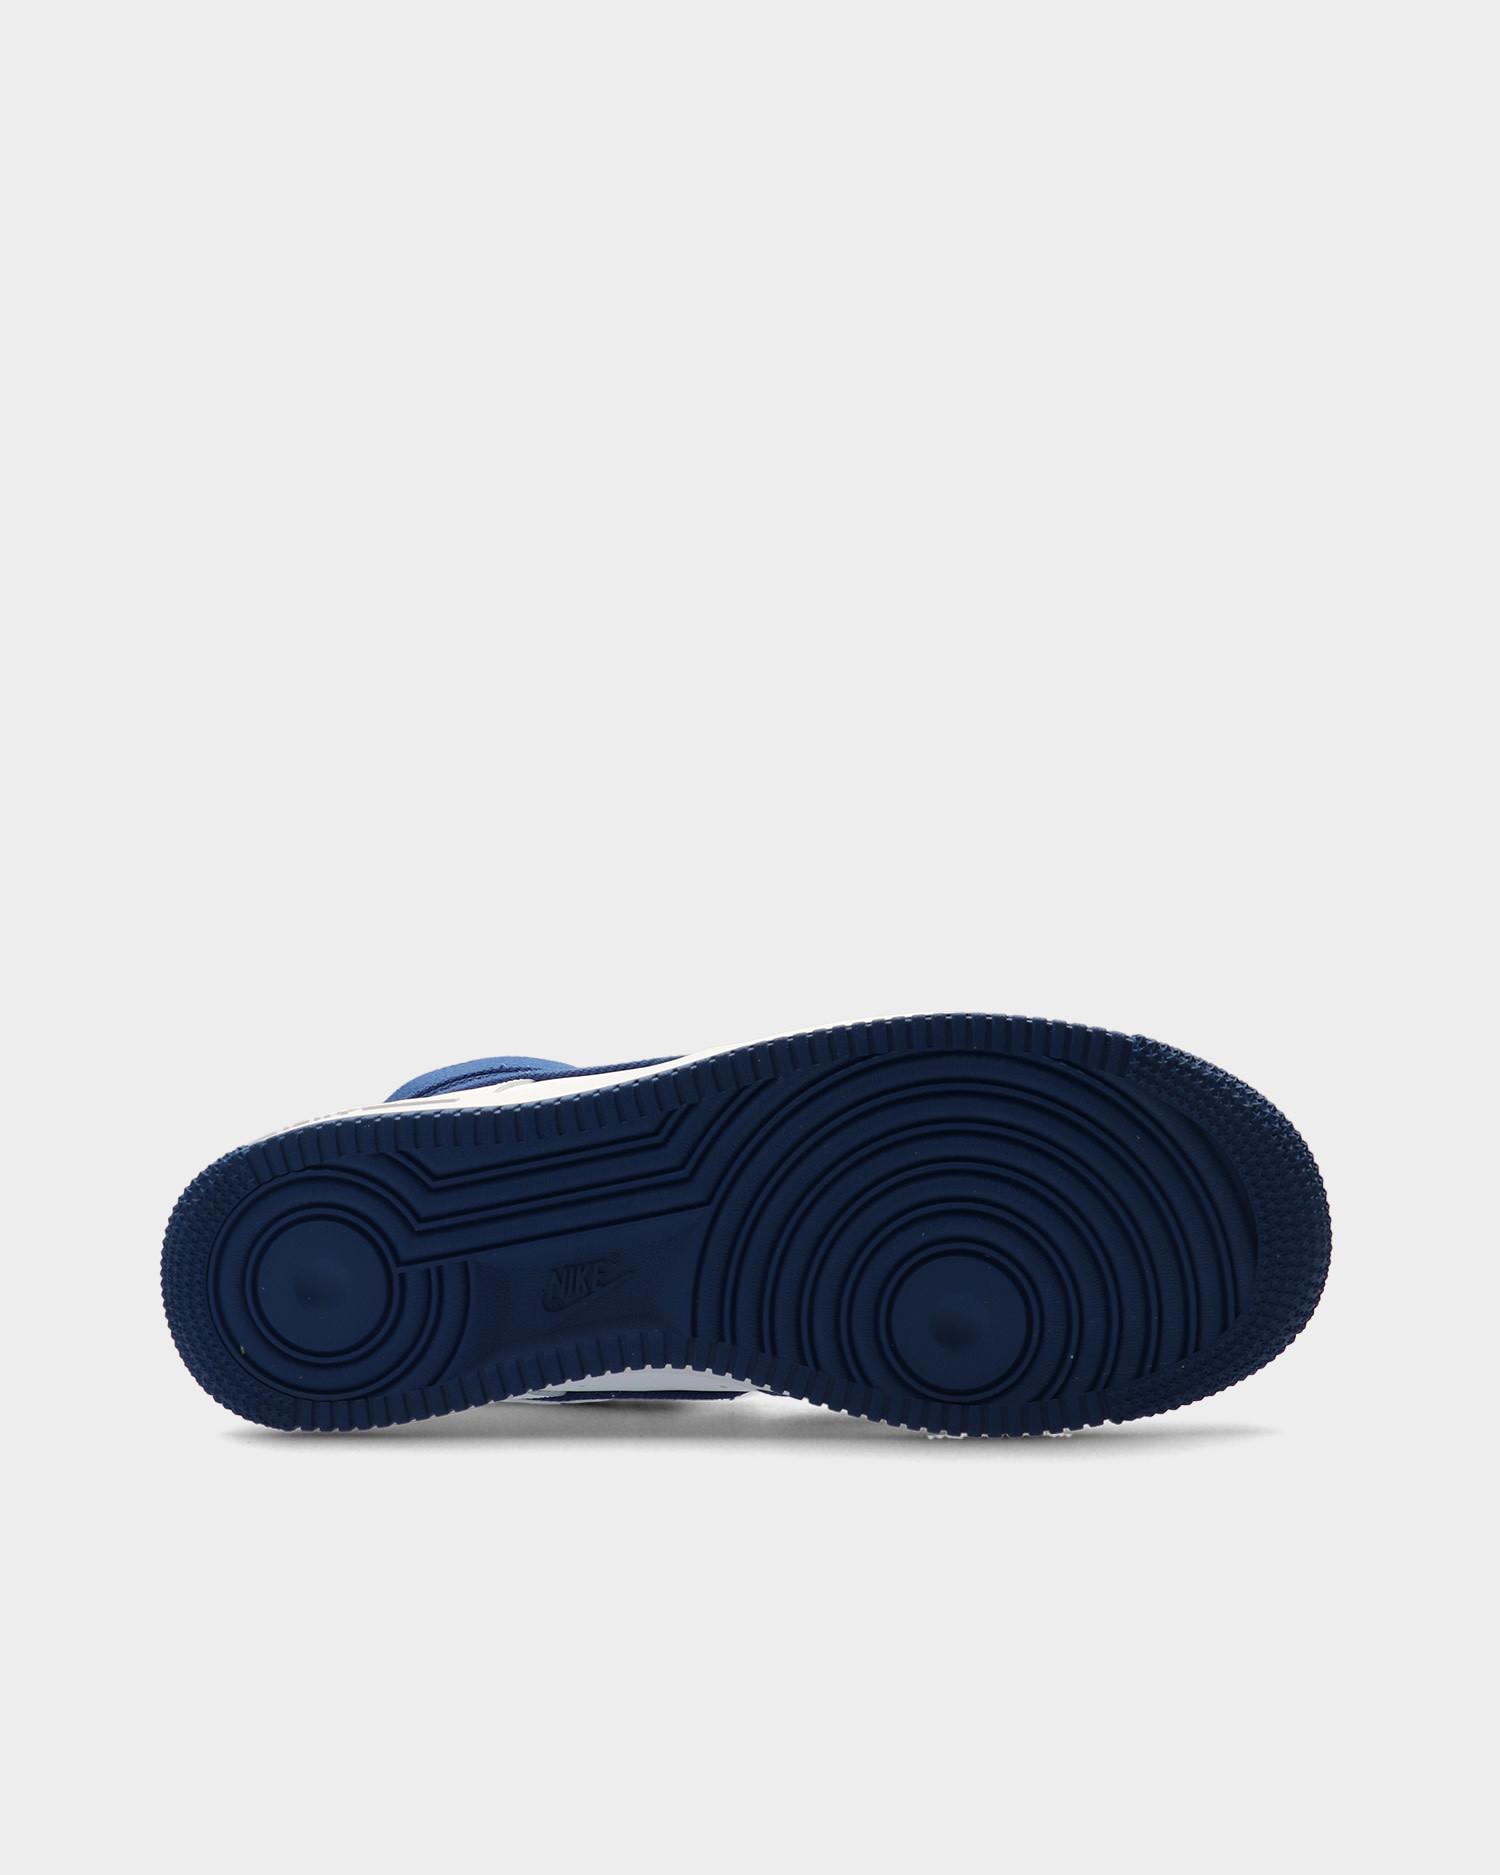 Nike Air force 1 high '07 lv8 emb White/rush blue-rush blue-white